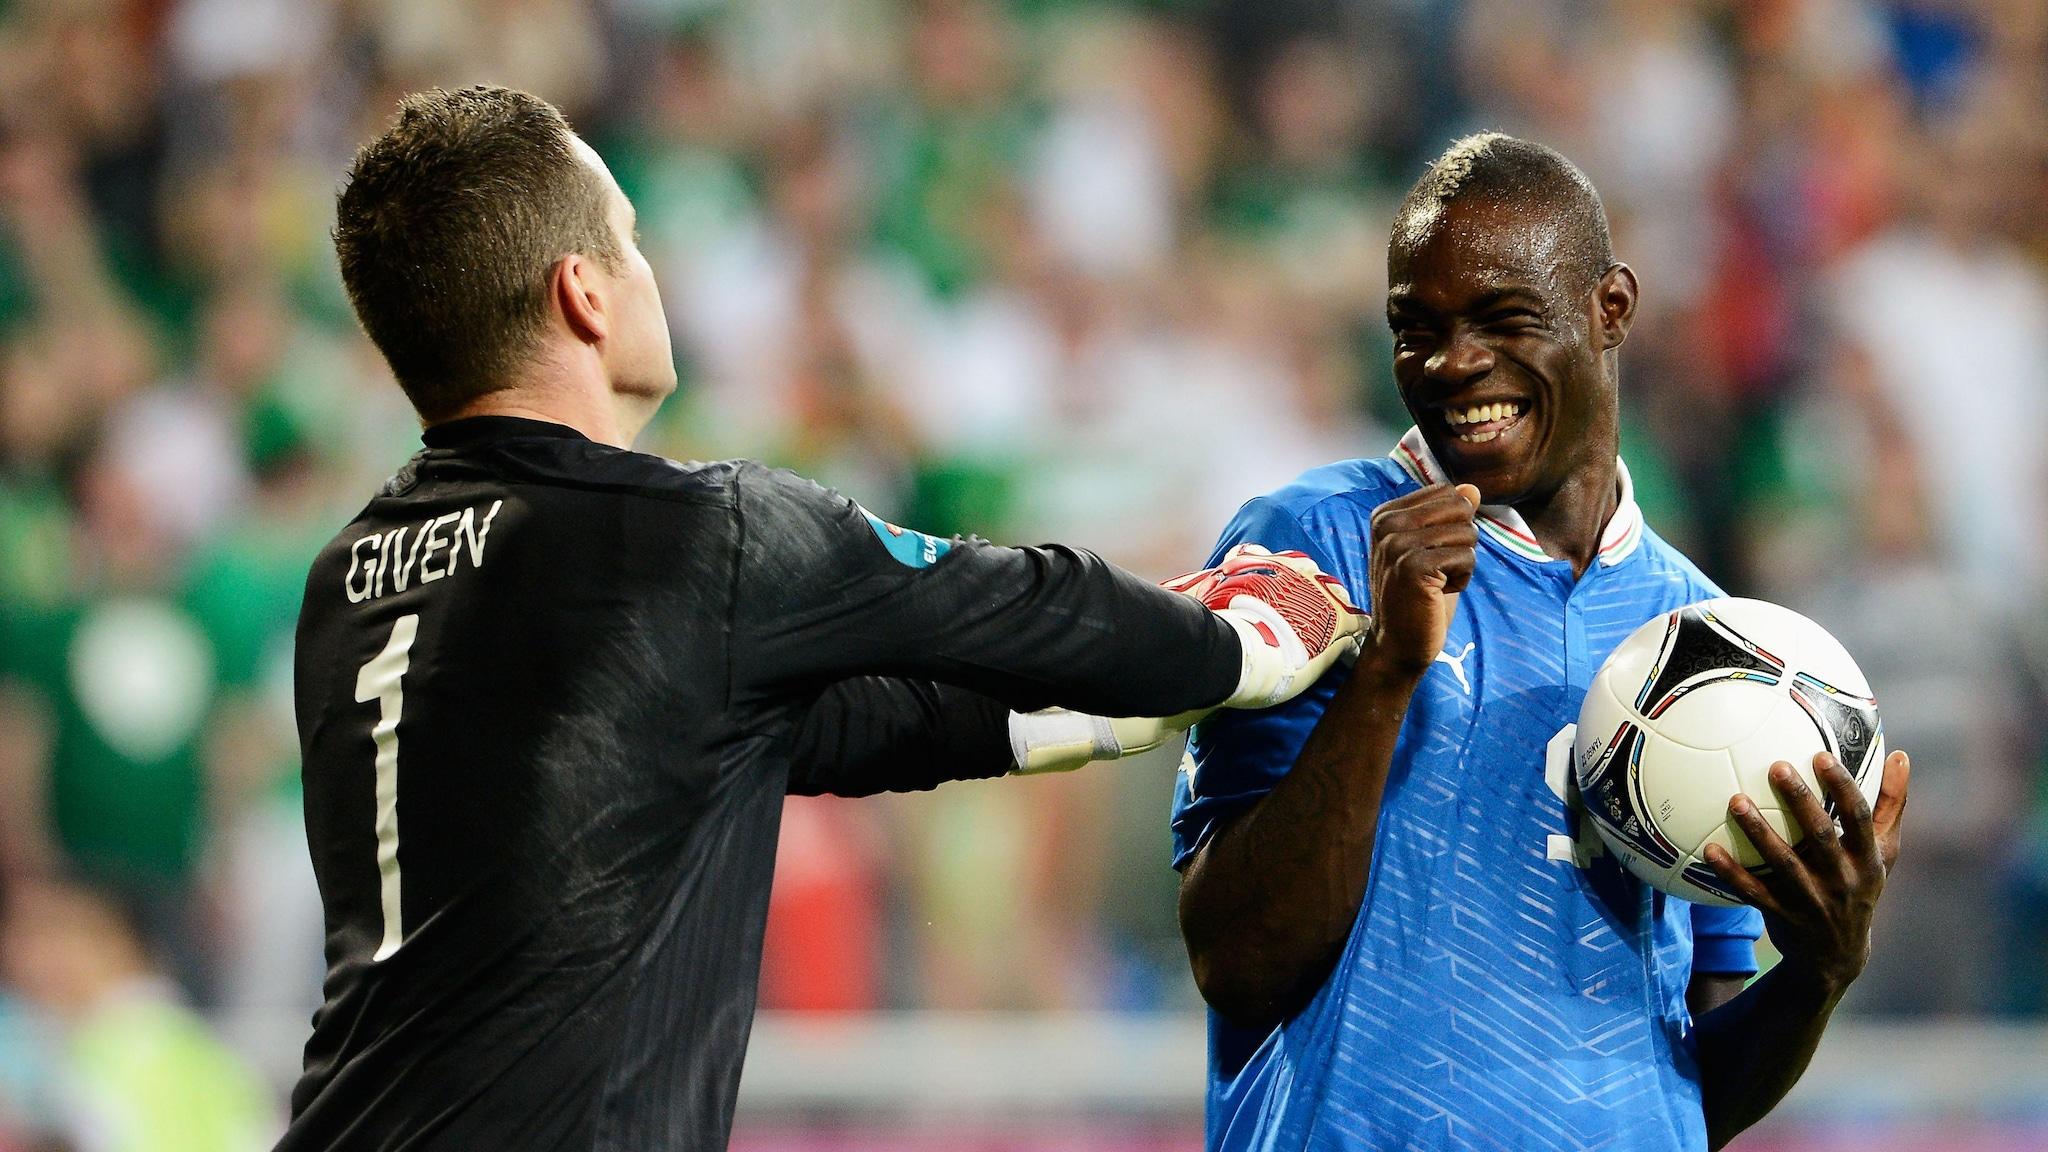 sinav: uefa euro 2012